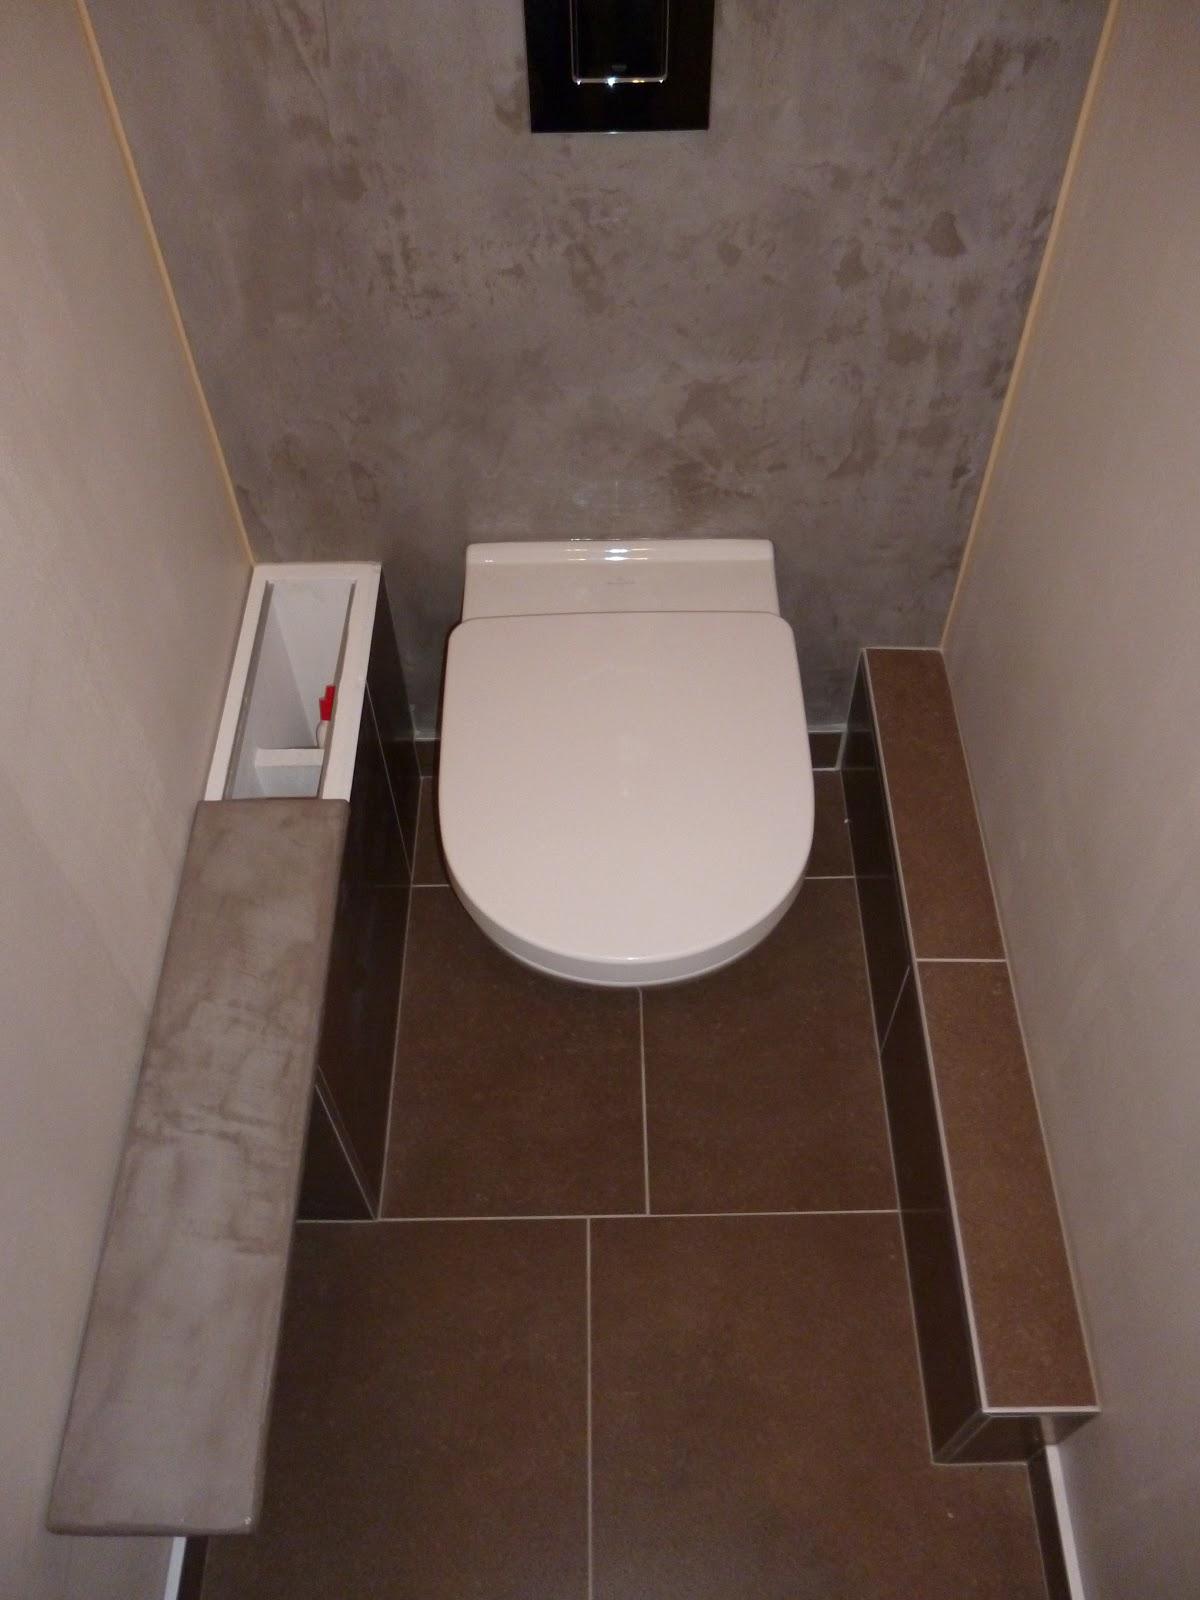 Toilette suspendue habillage b ton cir gris cendre sol for Carrelage auxerre